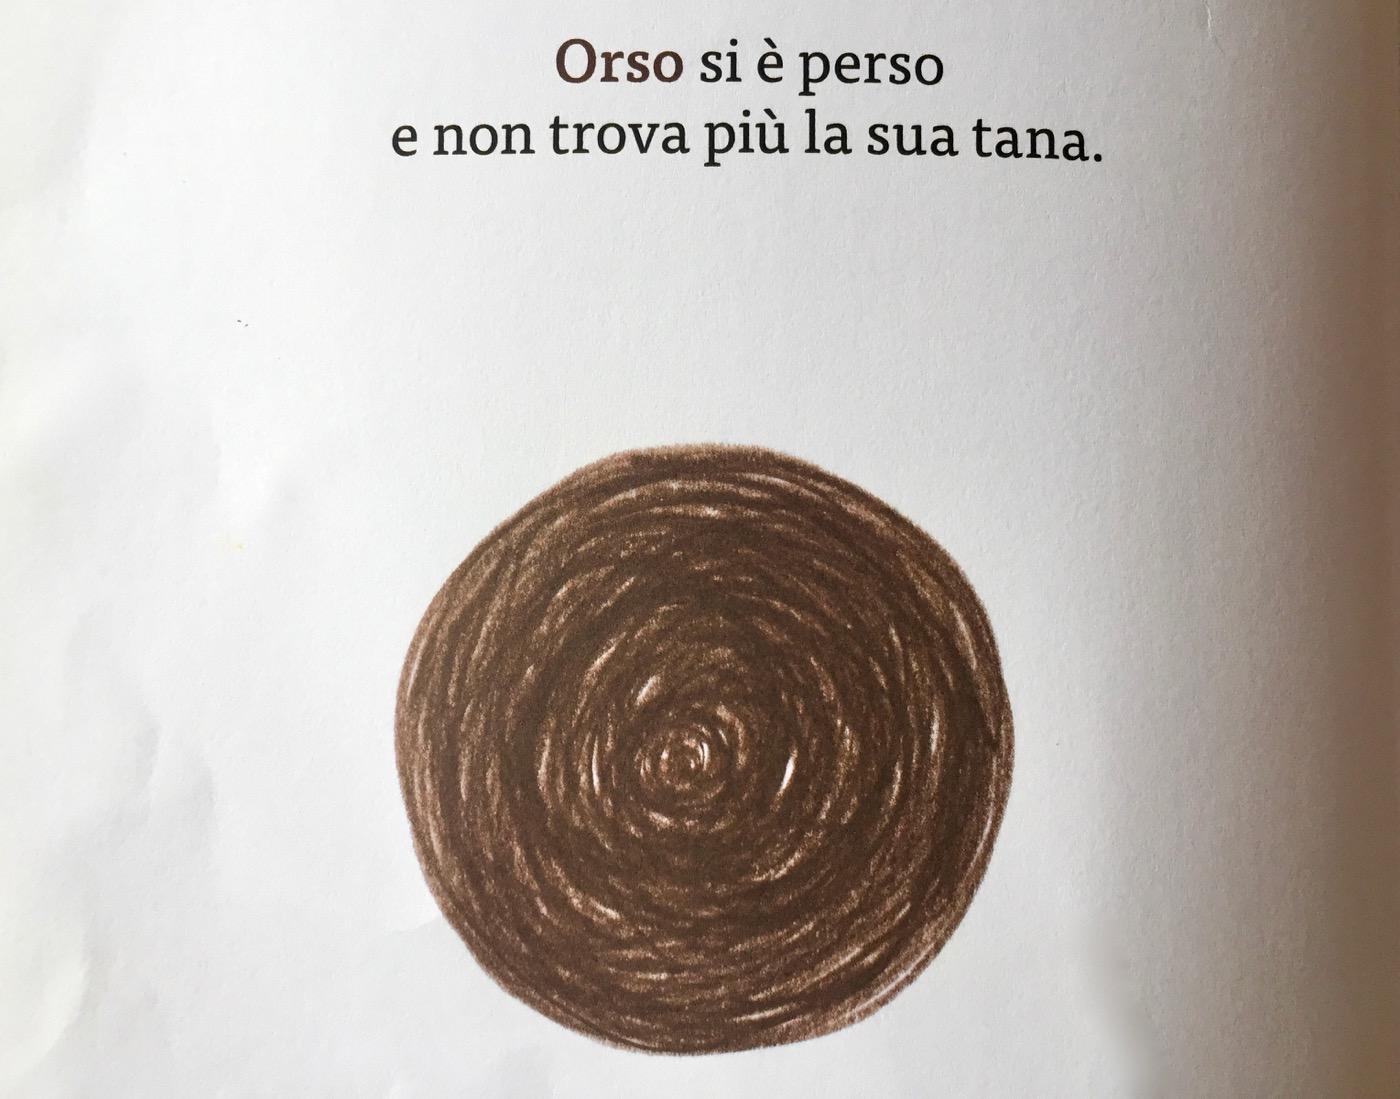 Orso, Buco! pagina interna